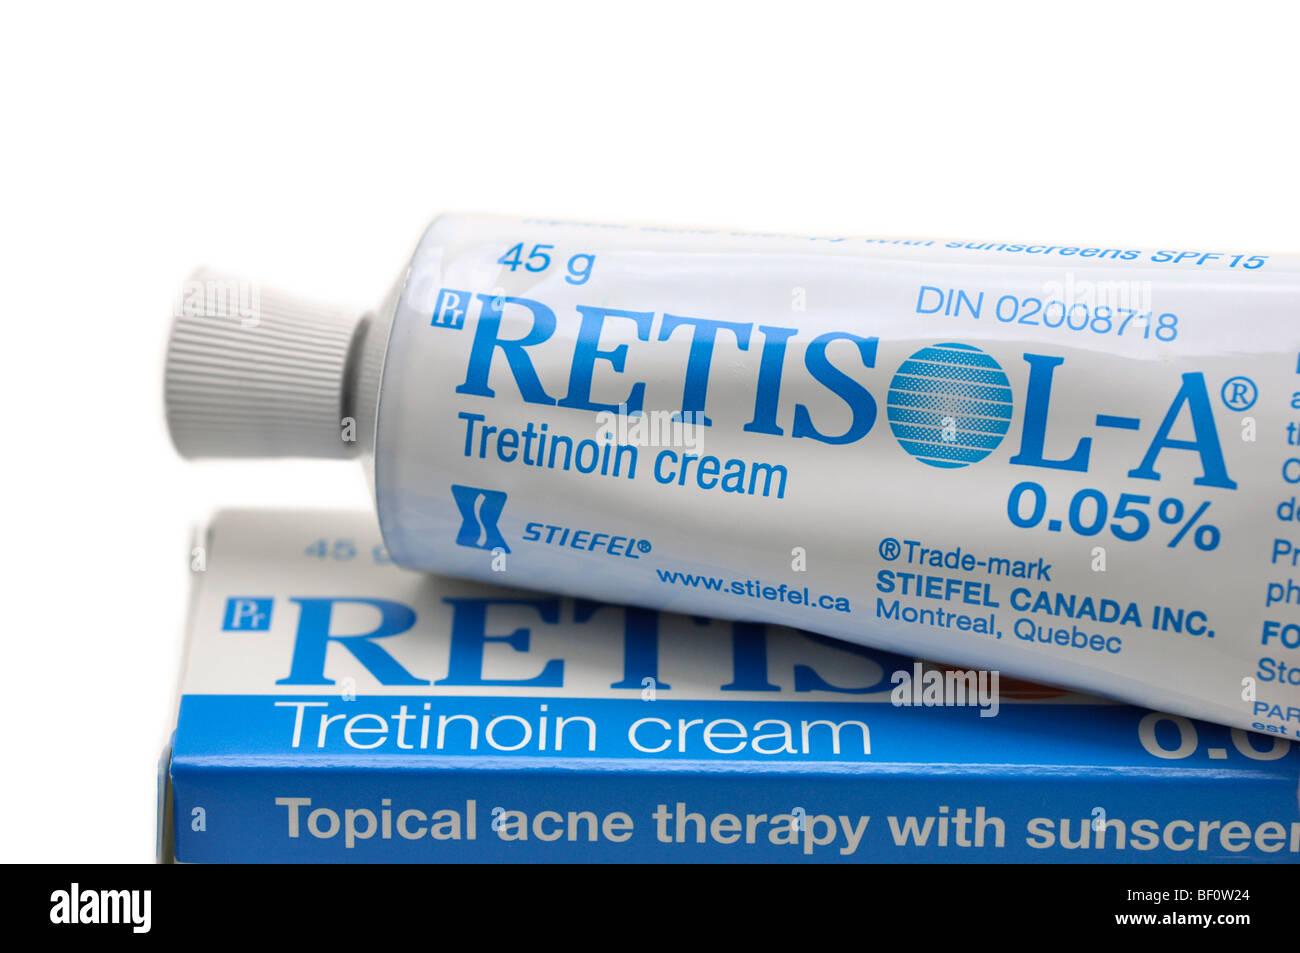 Tretinoin Creme - topische Akne-Therapie Stockbild